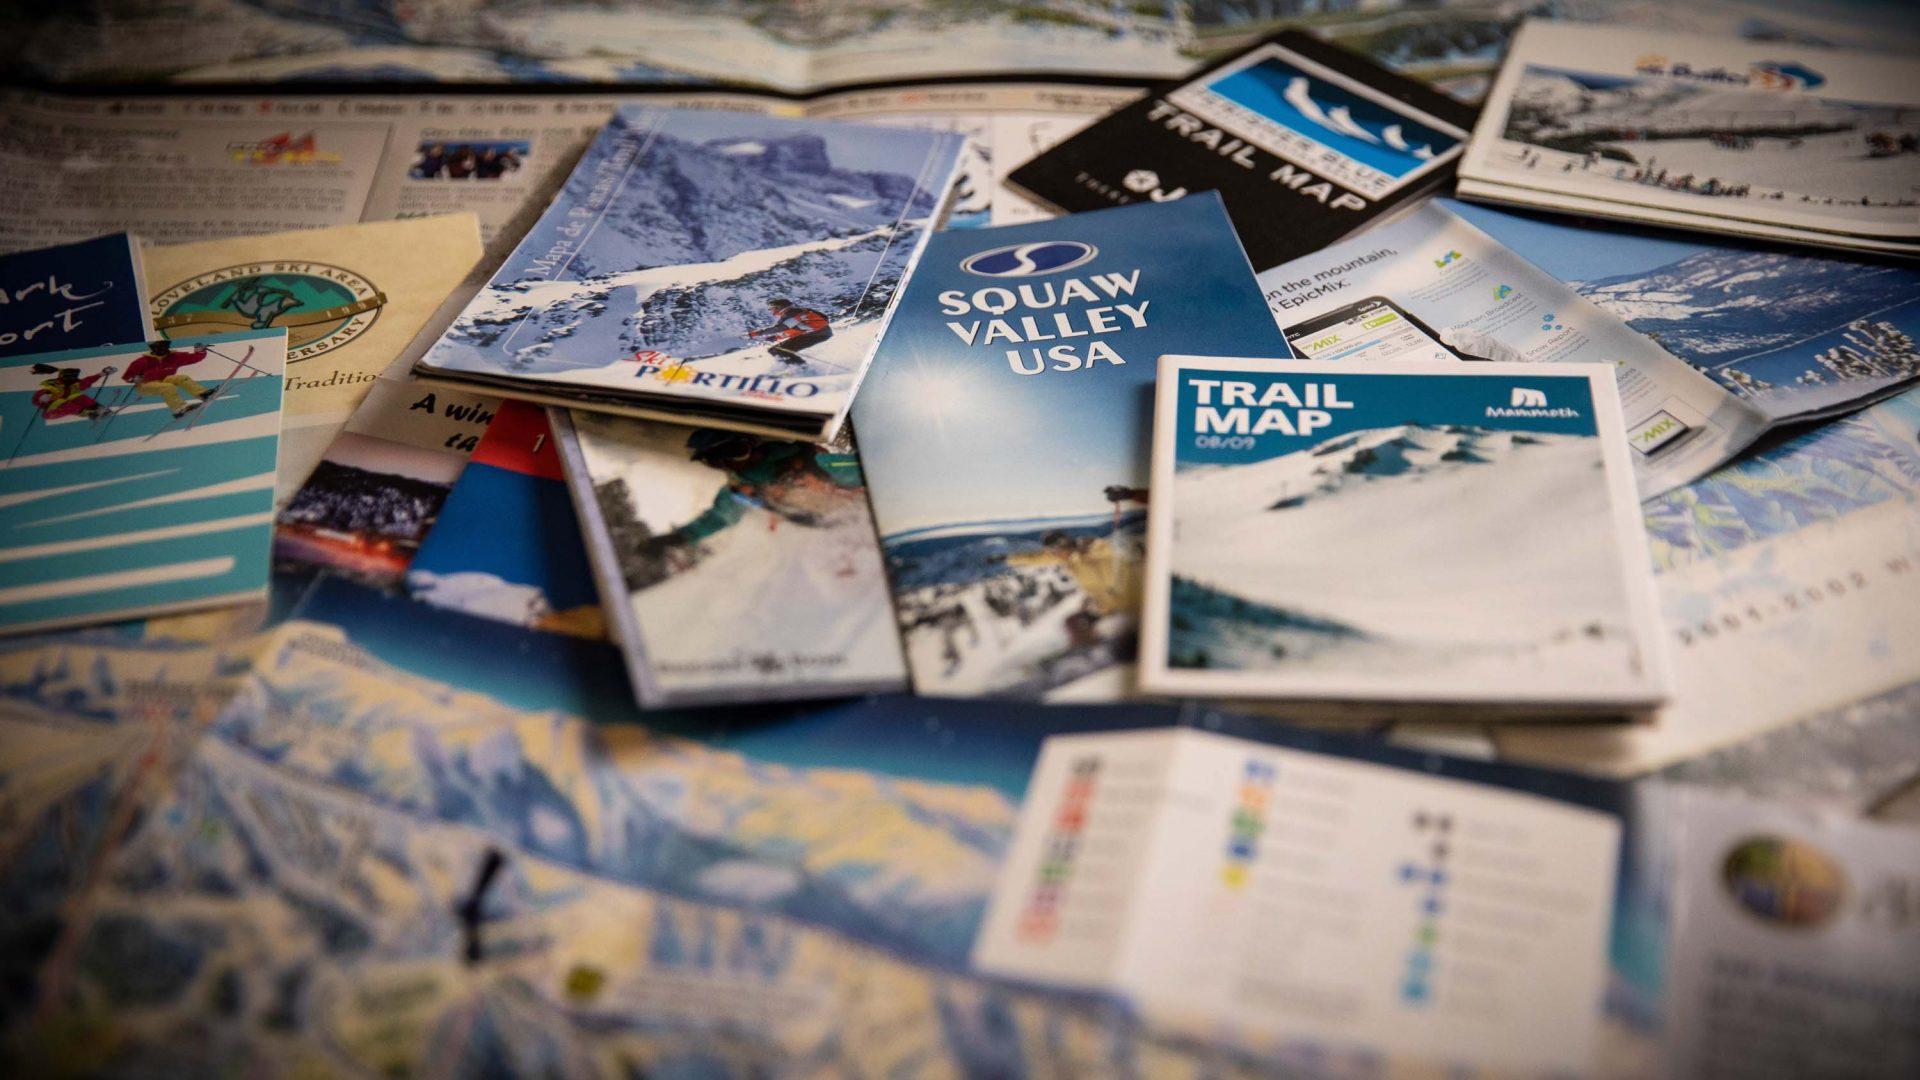 Trail maps full of James's illustrations.